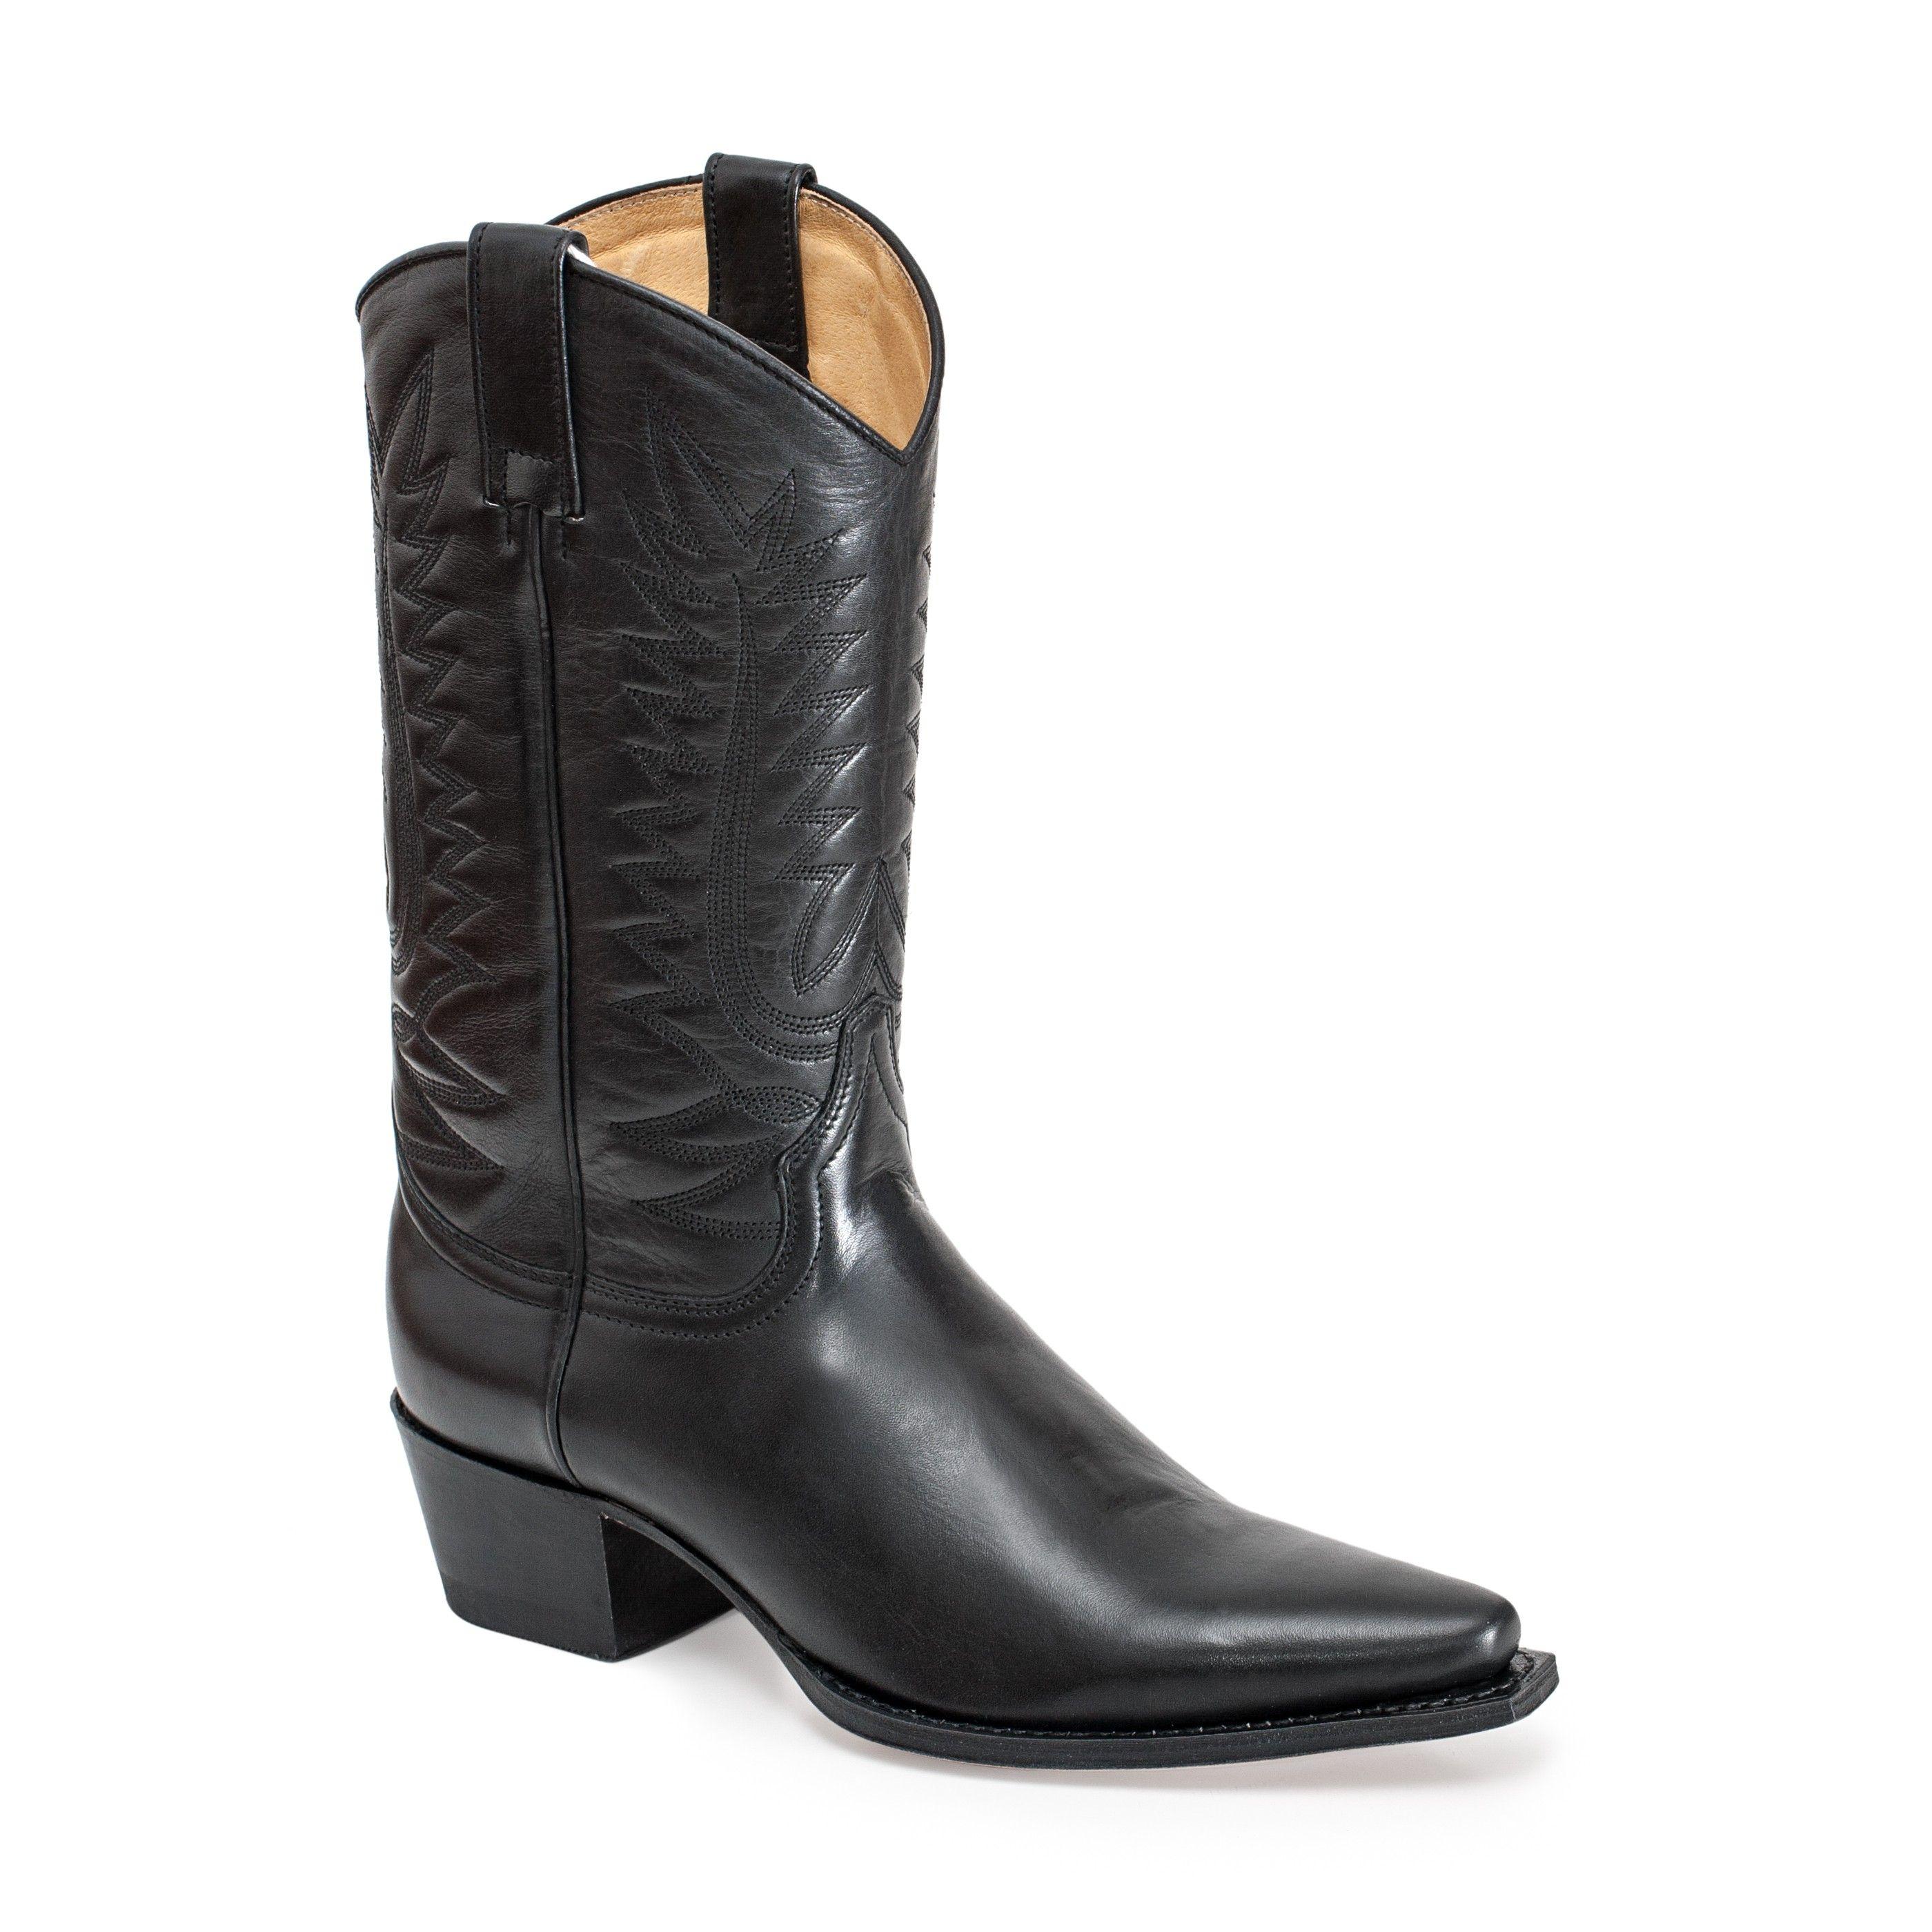 6204664d0d Sendra Boots 7280 Gene Anilina Negro #Botasonline #botas #boots ...